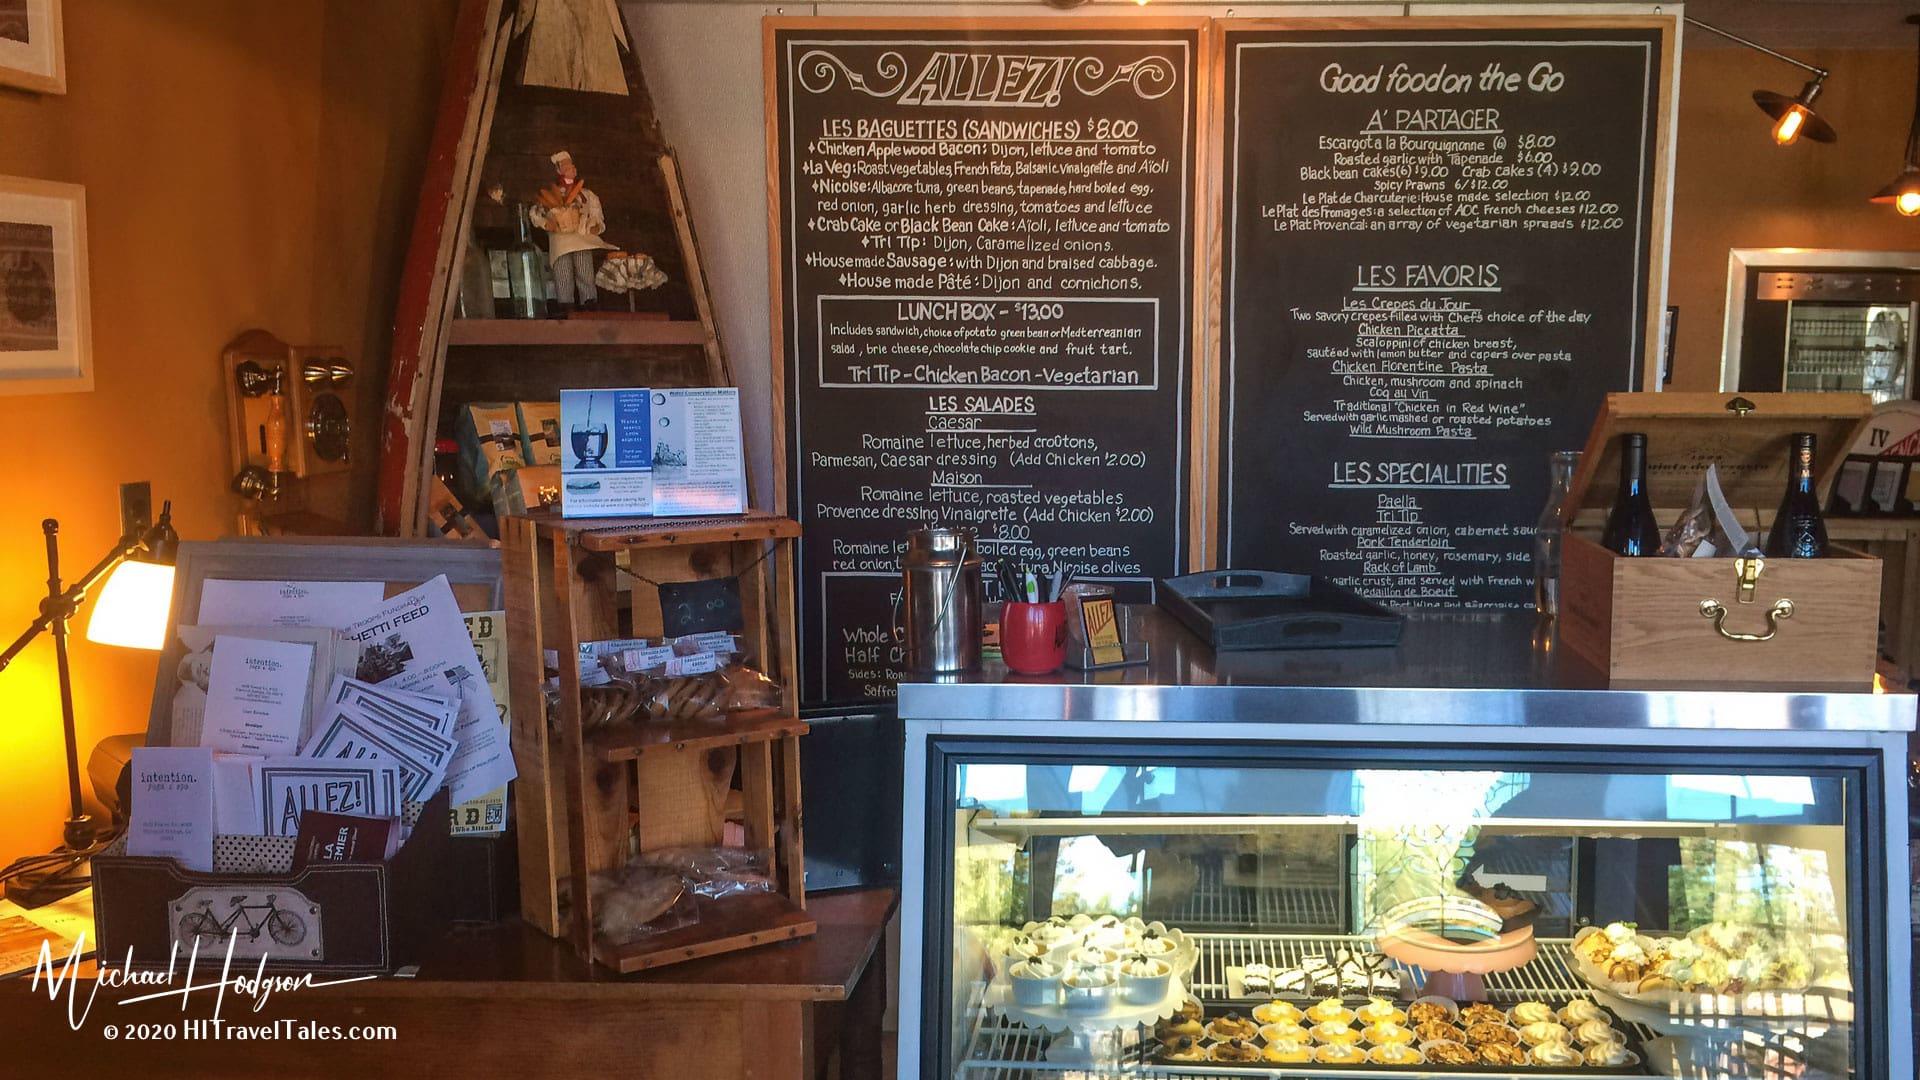 Inside Allez! French Restaurant